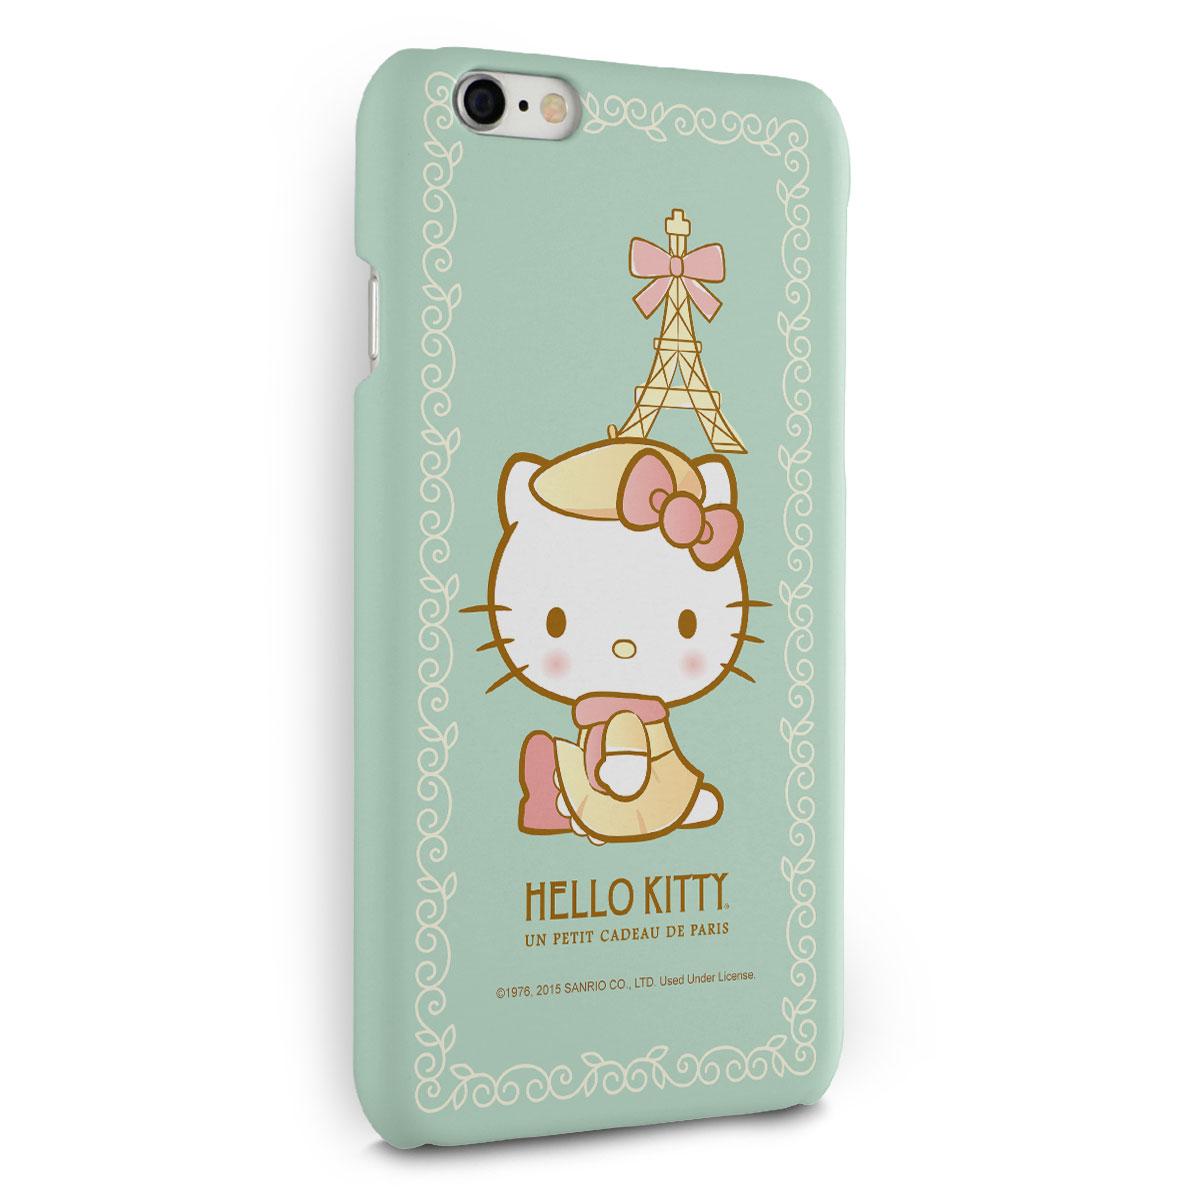 Capa para iPhone 6/6S Plus Hello Kitty Un Petit Cadeau